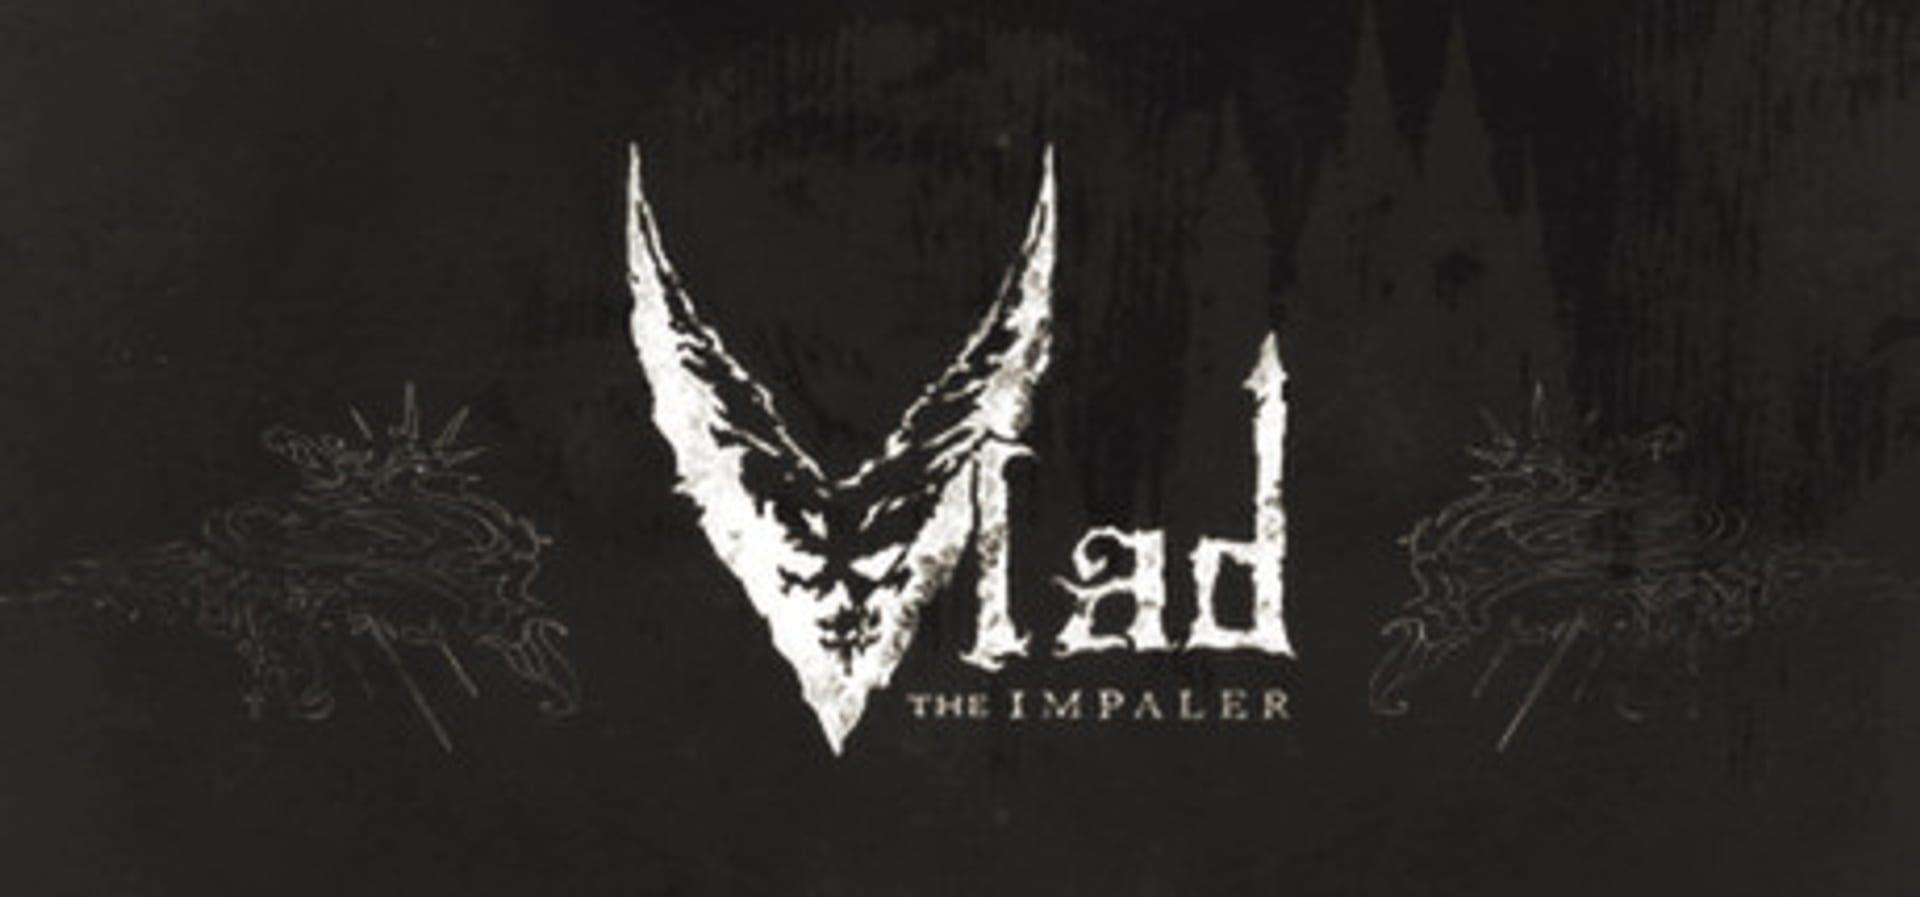 buy Vlad the Impaler cd key for xbox platform